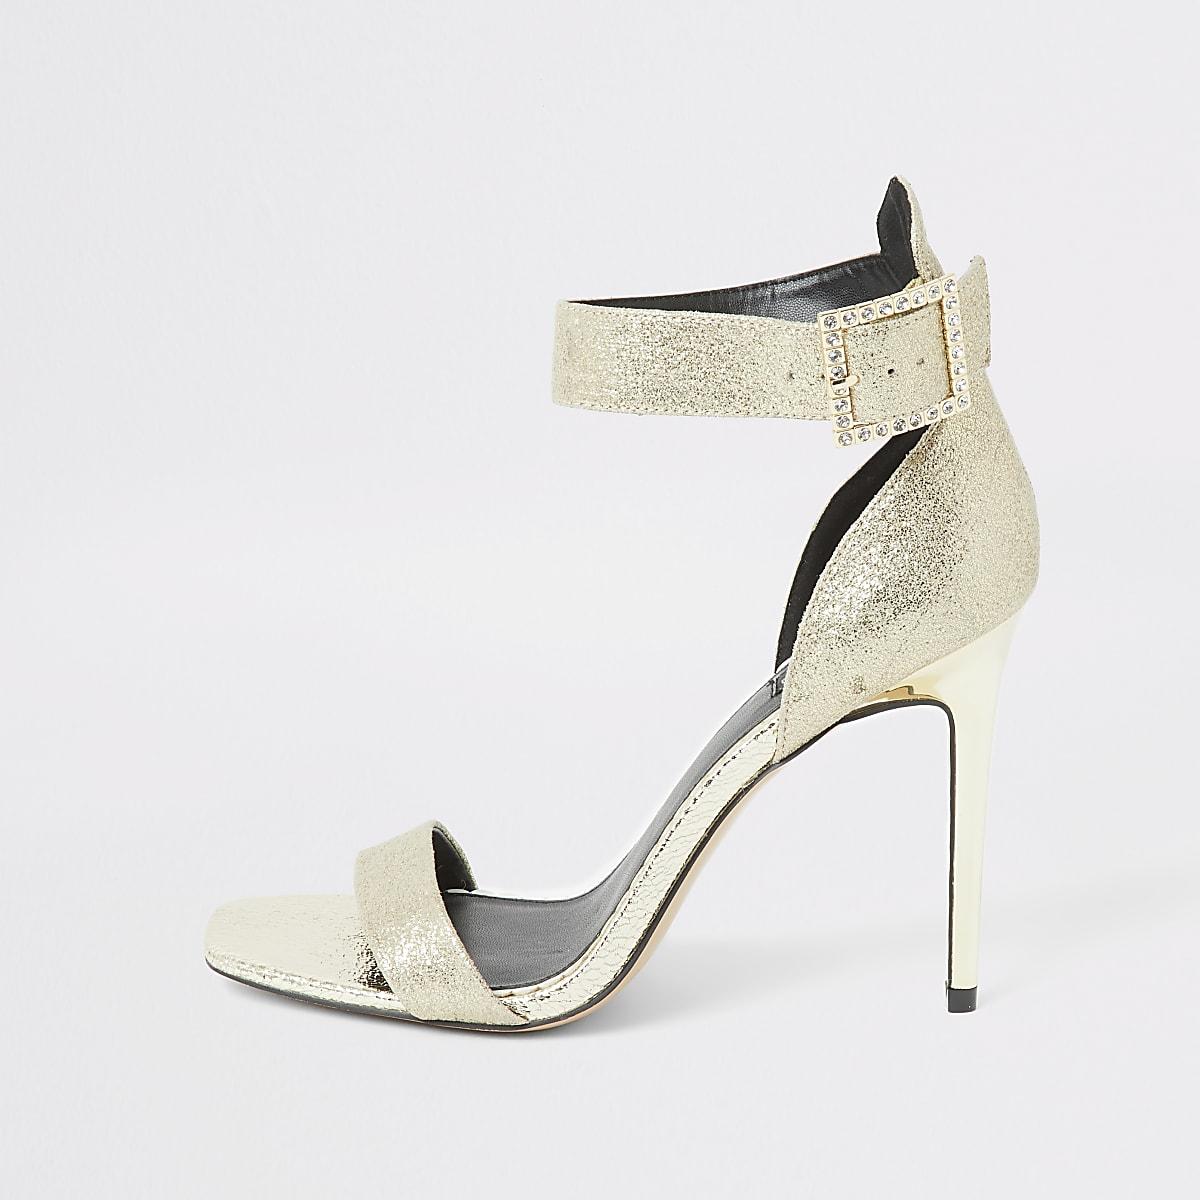 Goudkleurige sandaal met gesp en brede pasvorm